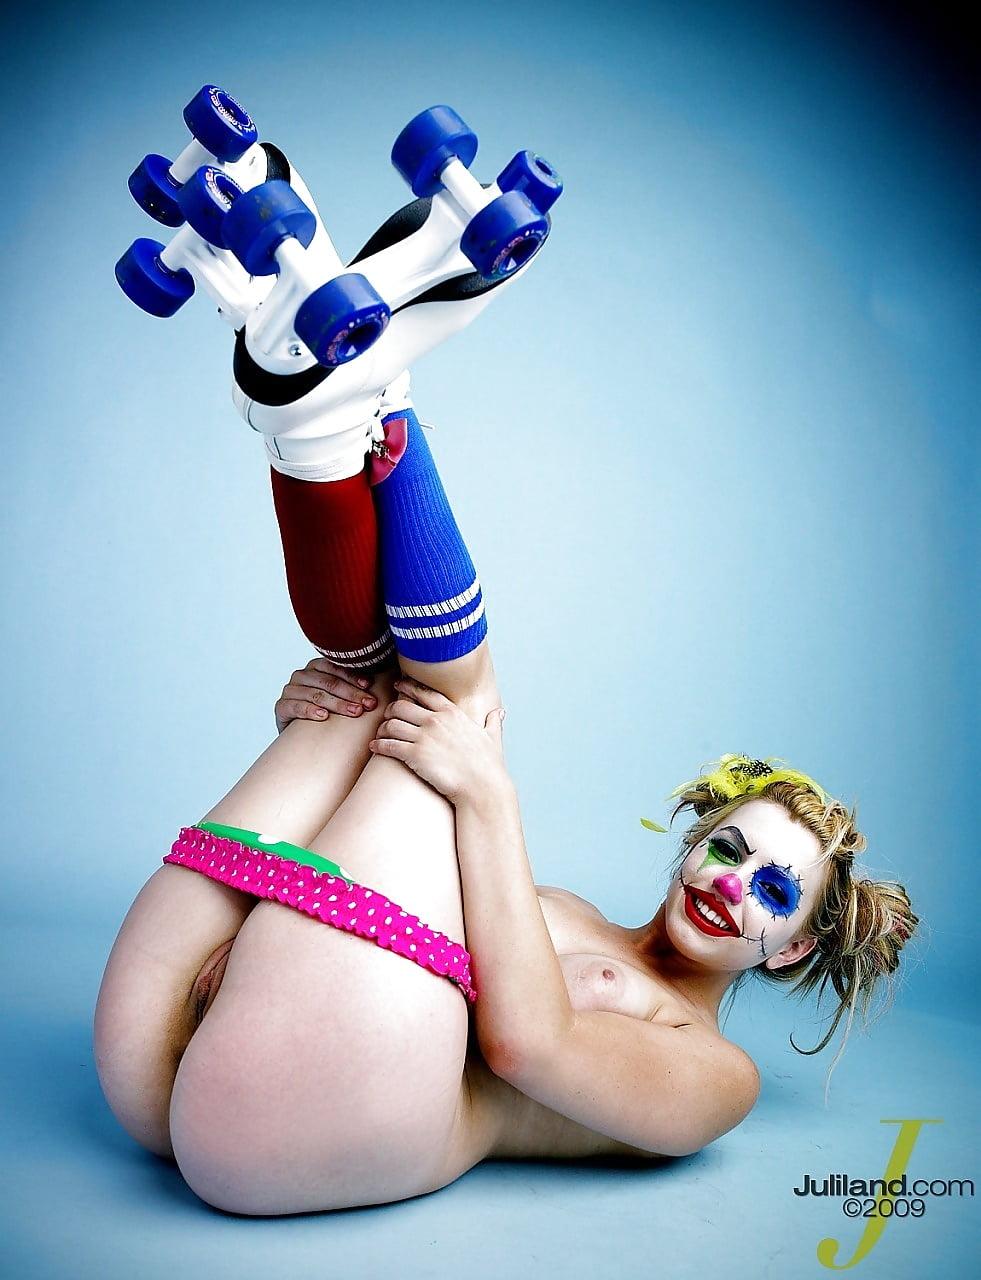 hypno-show-free-clown-porn-sexi-video